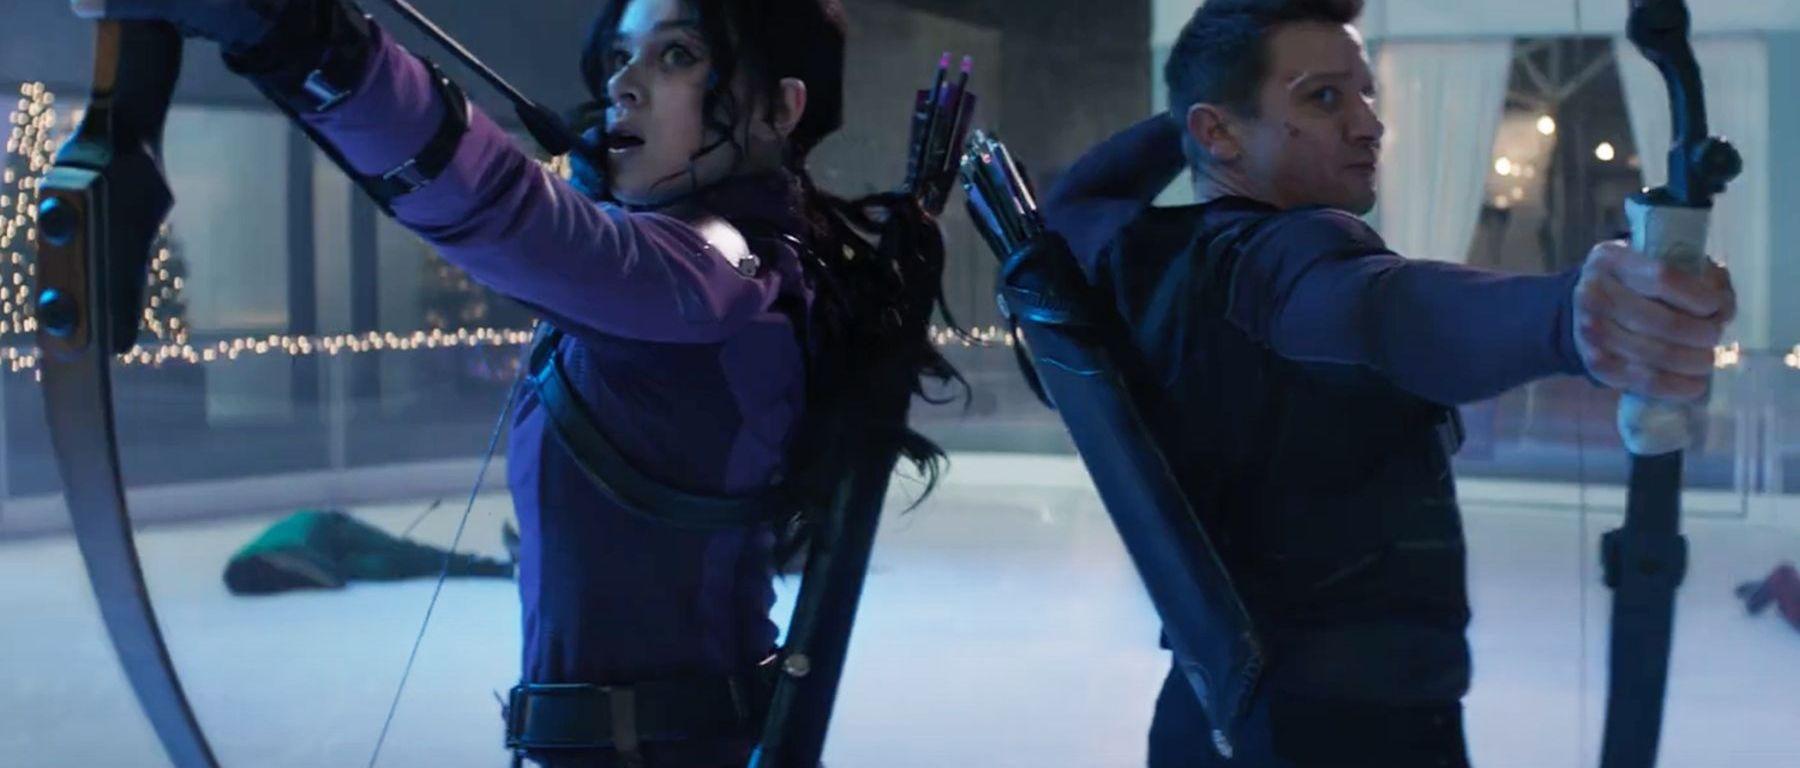 Trailerul filmului Hawkeye o aduce pe Kate Bishop în zona MCU